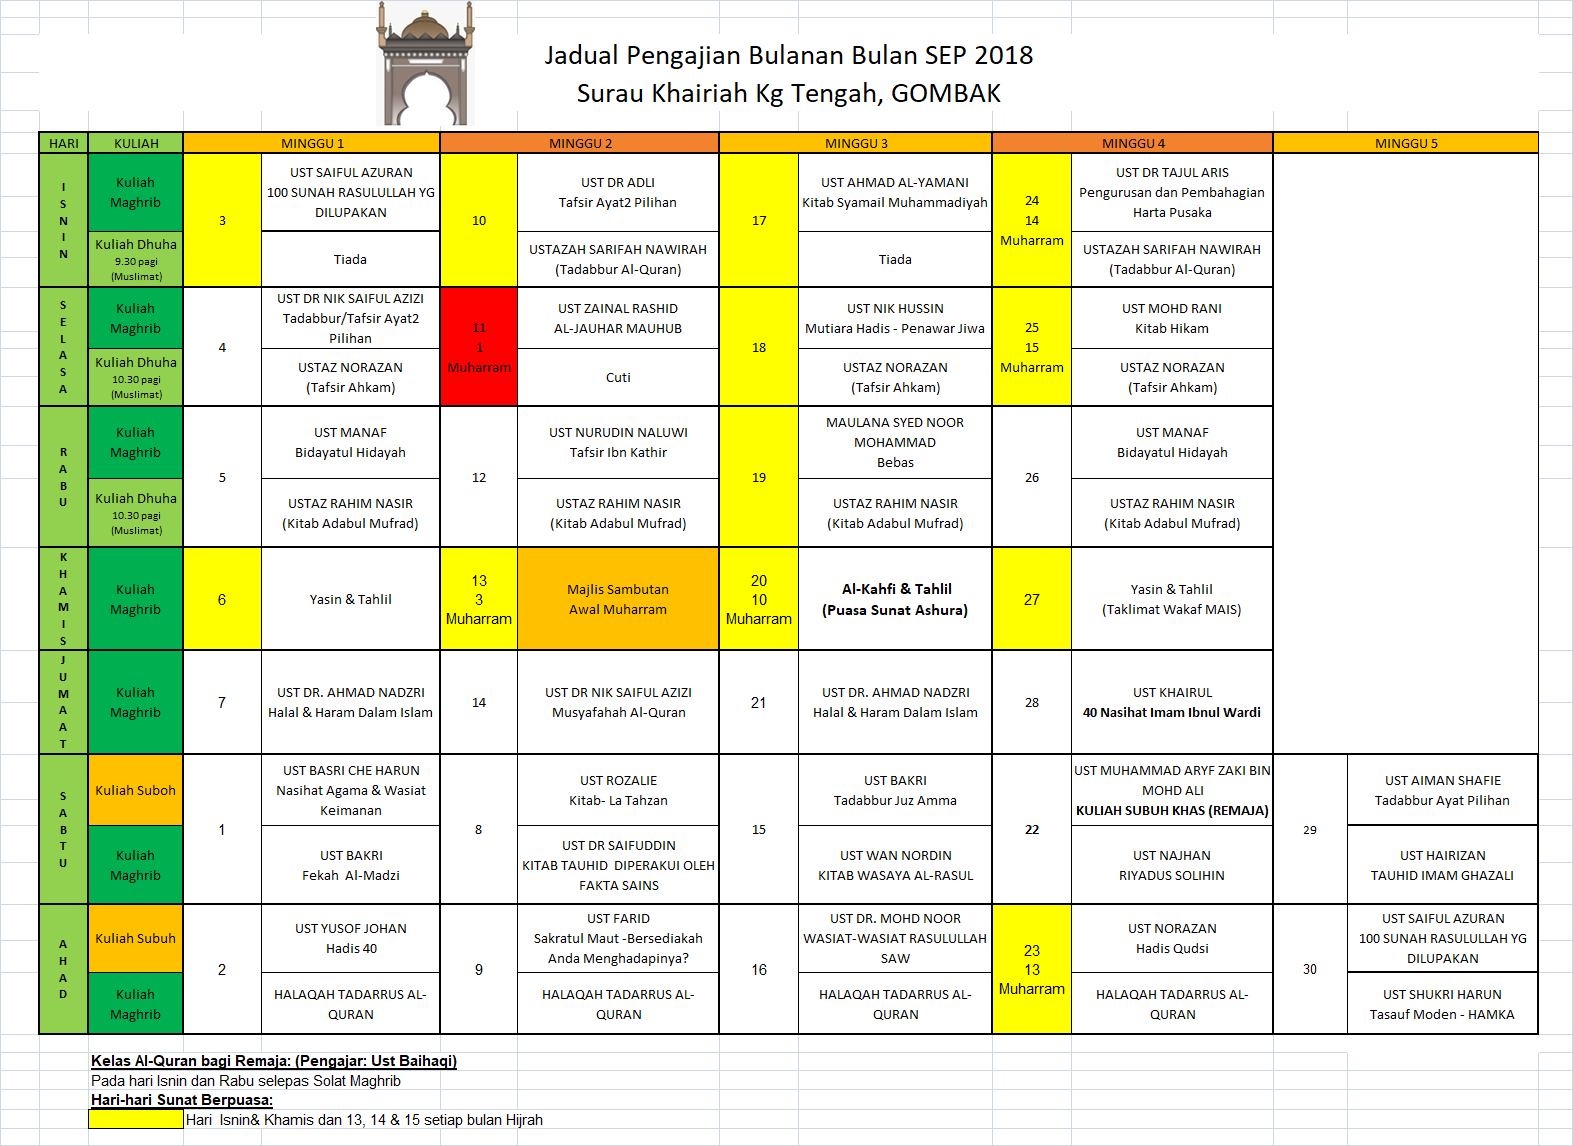 Jadual Pengajian Sep 2018